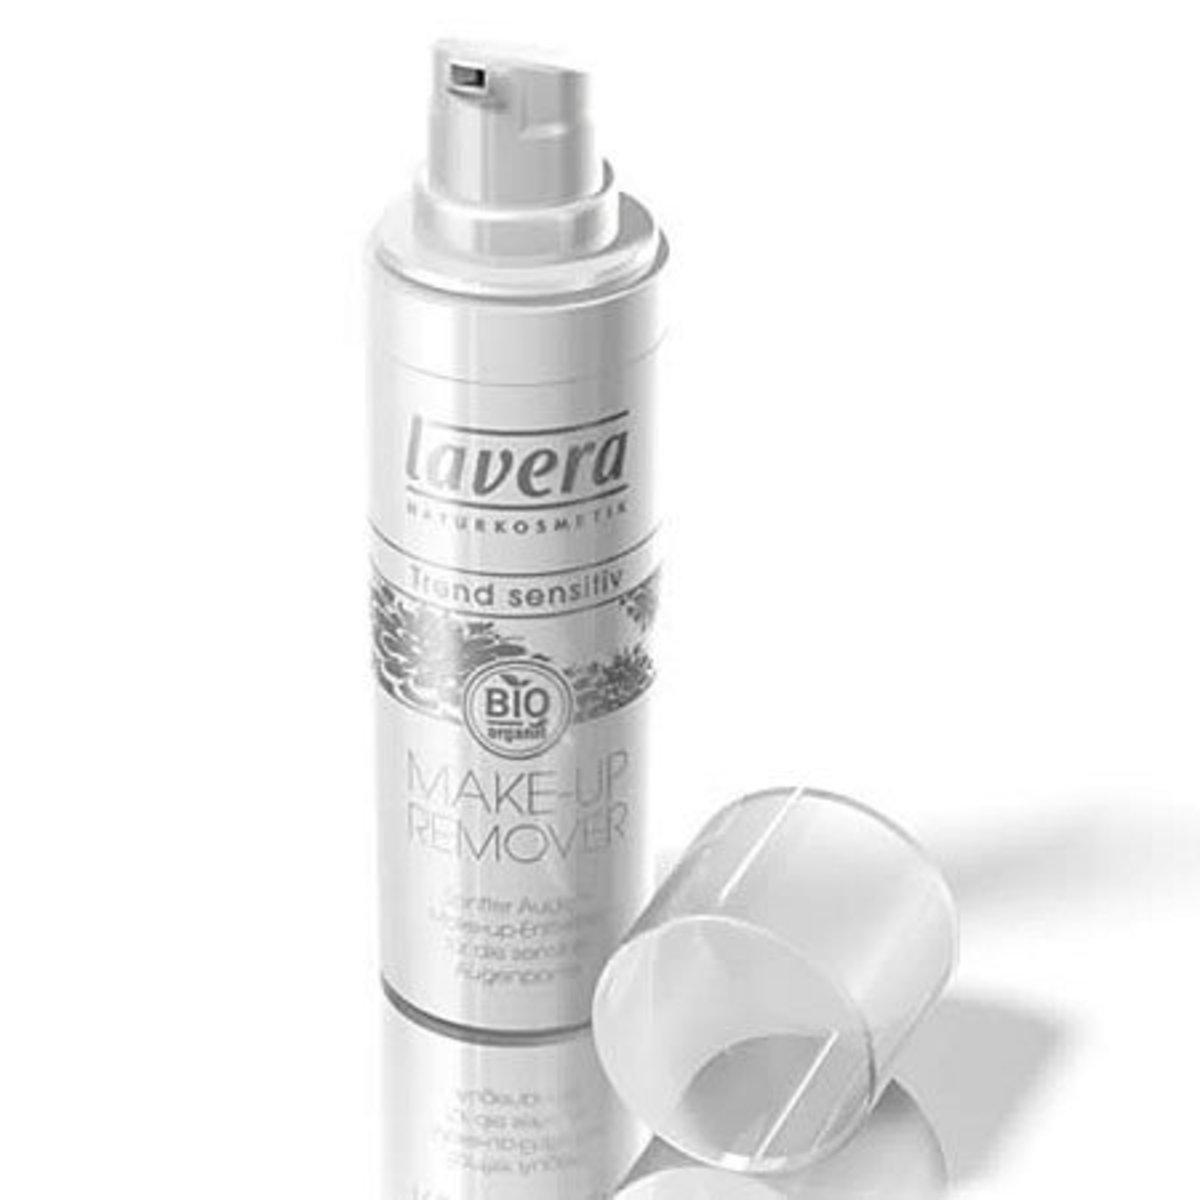 Lavera Gentle Makeup Remover